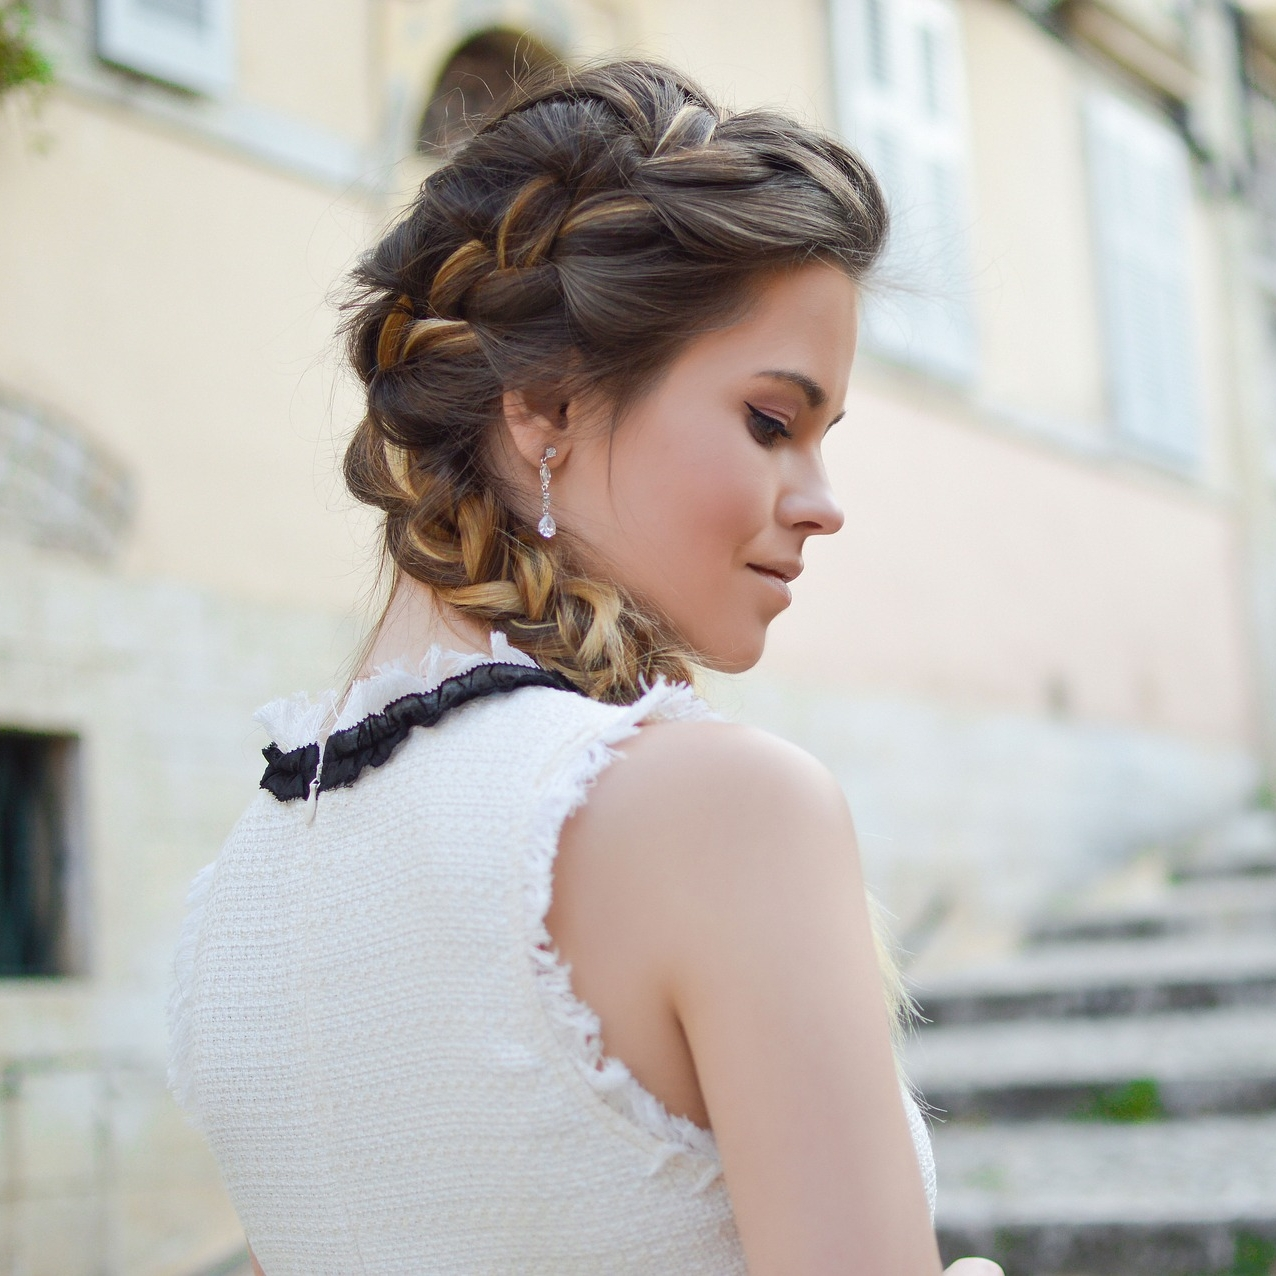 Styling - BraidsBlow-DryBlow-Dry + CurlsAdd-On Curls